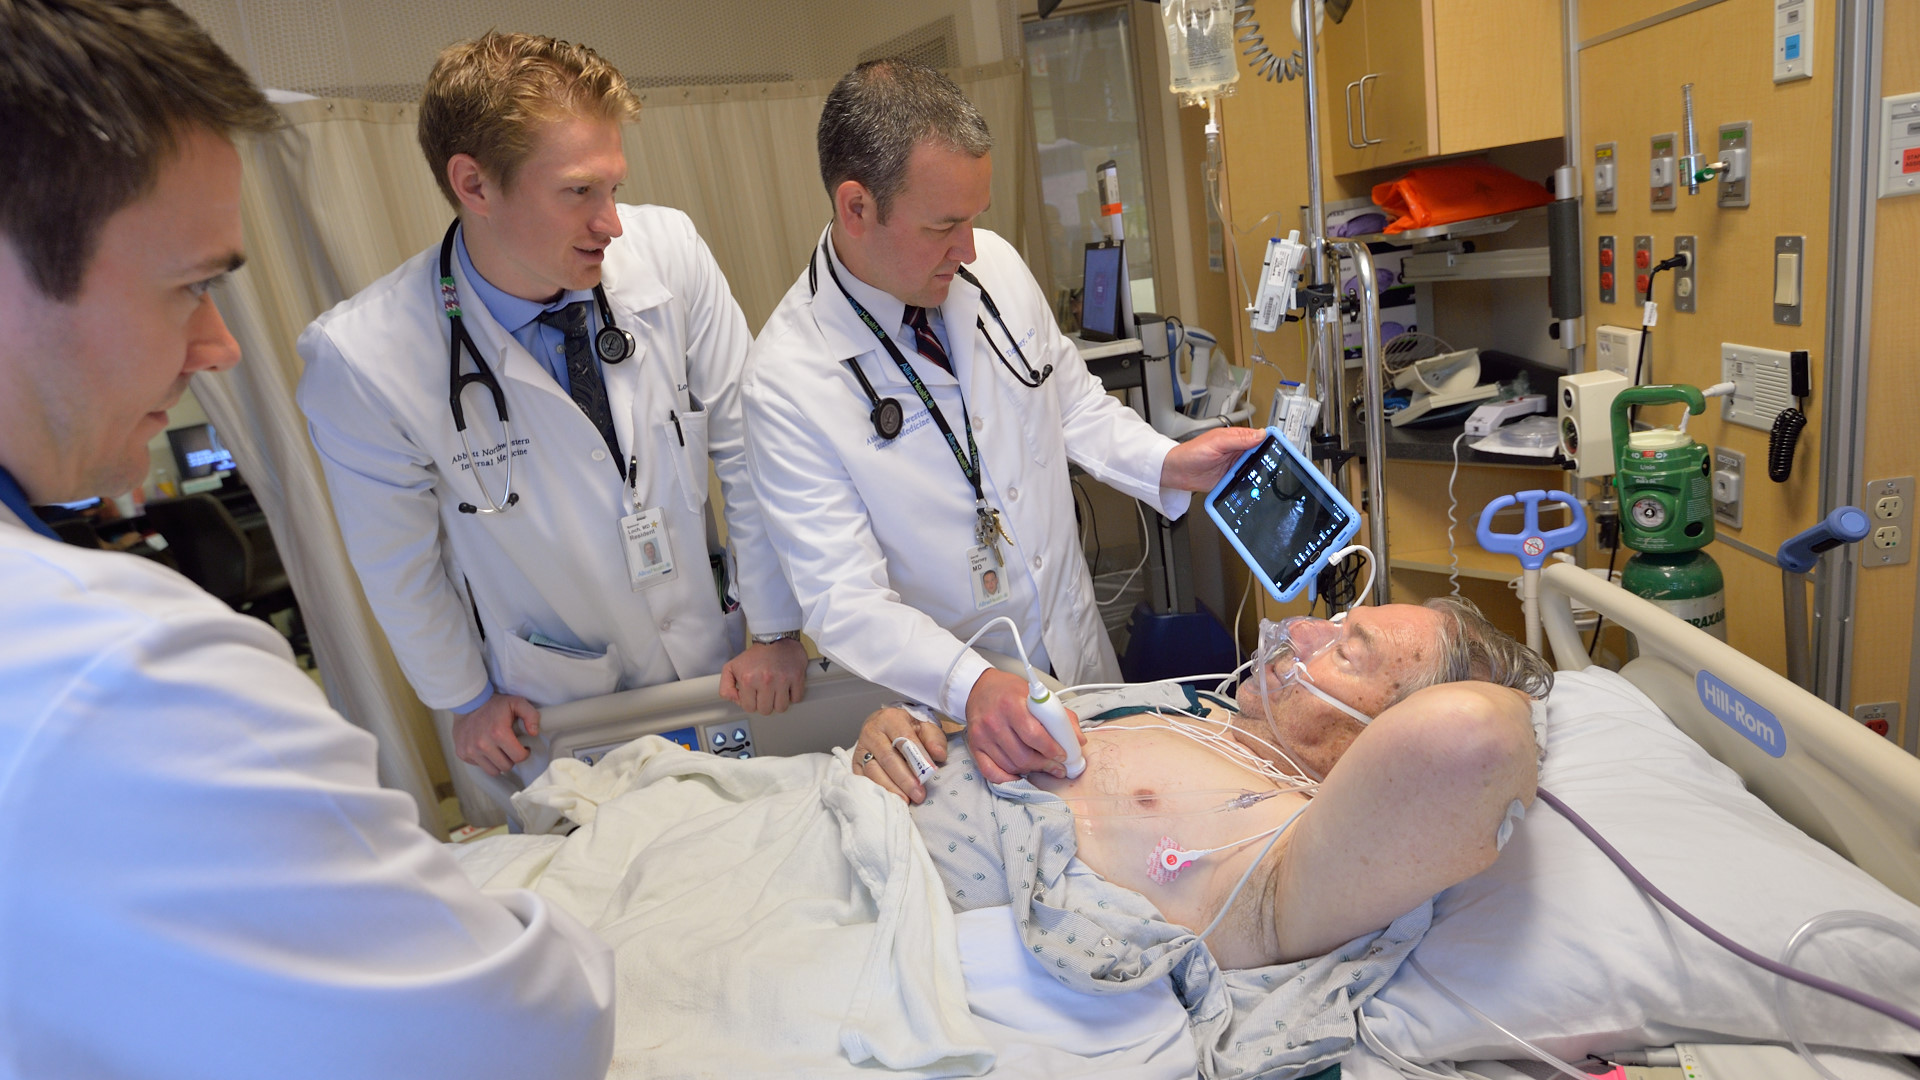 Defining Internal Medicine Bedside Ultrasound at Abbott